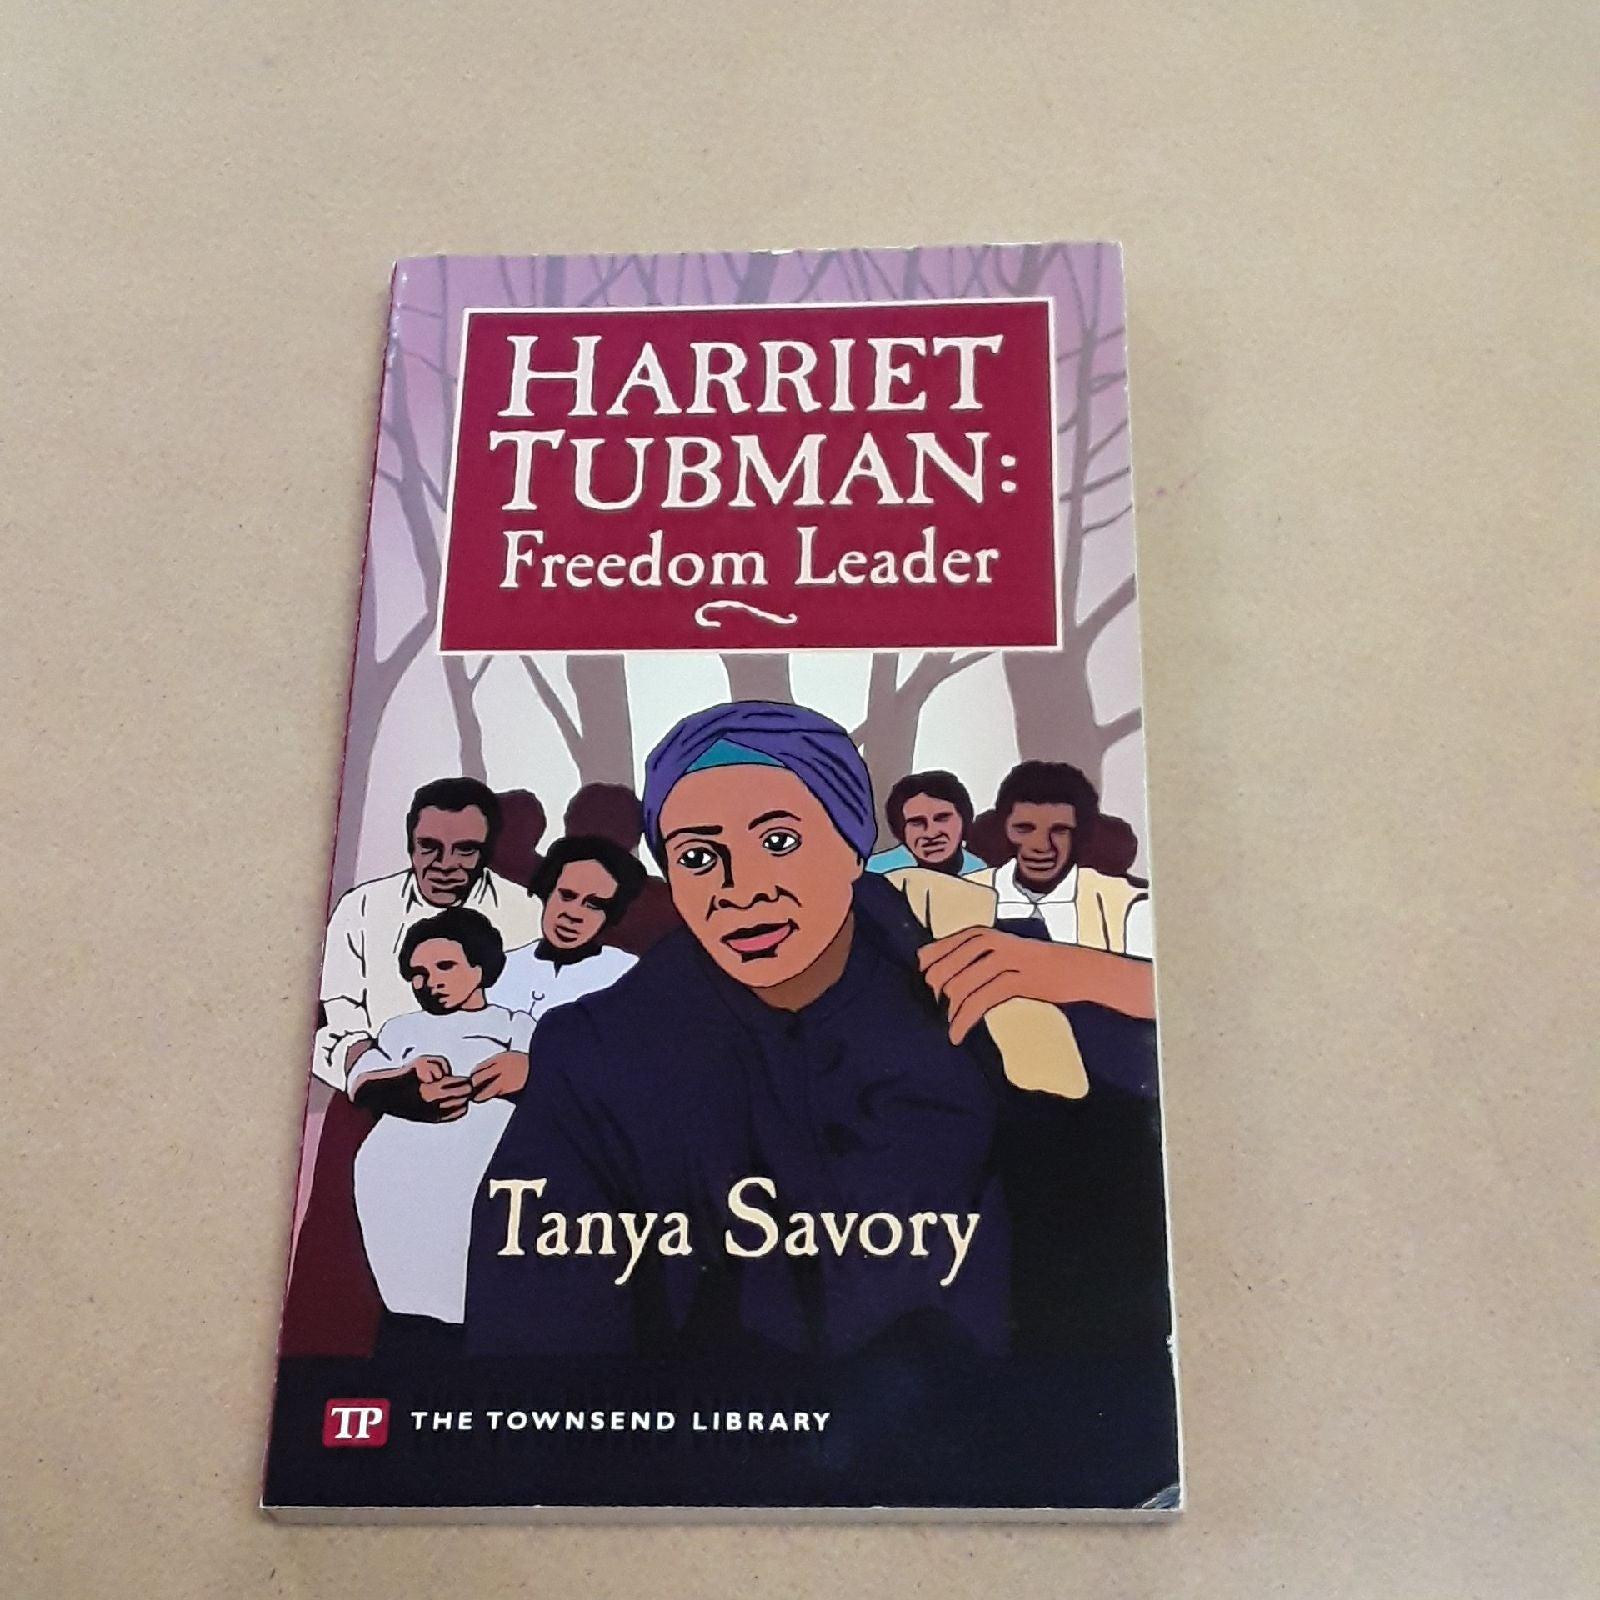 HARRIET TUBMAN: Freedom Leader Book